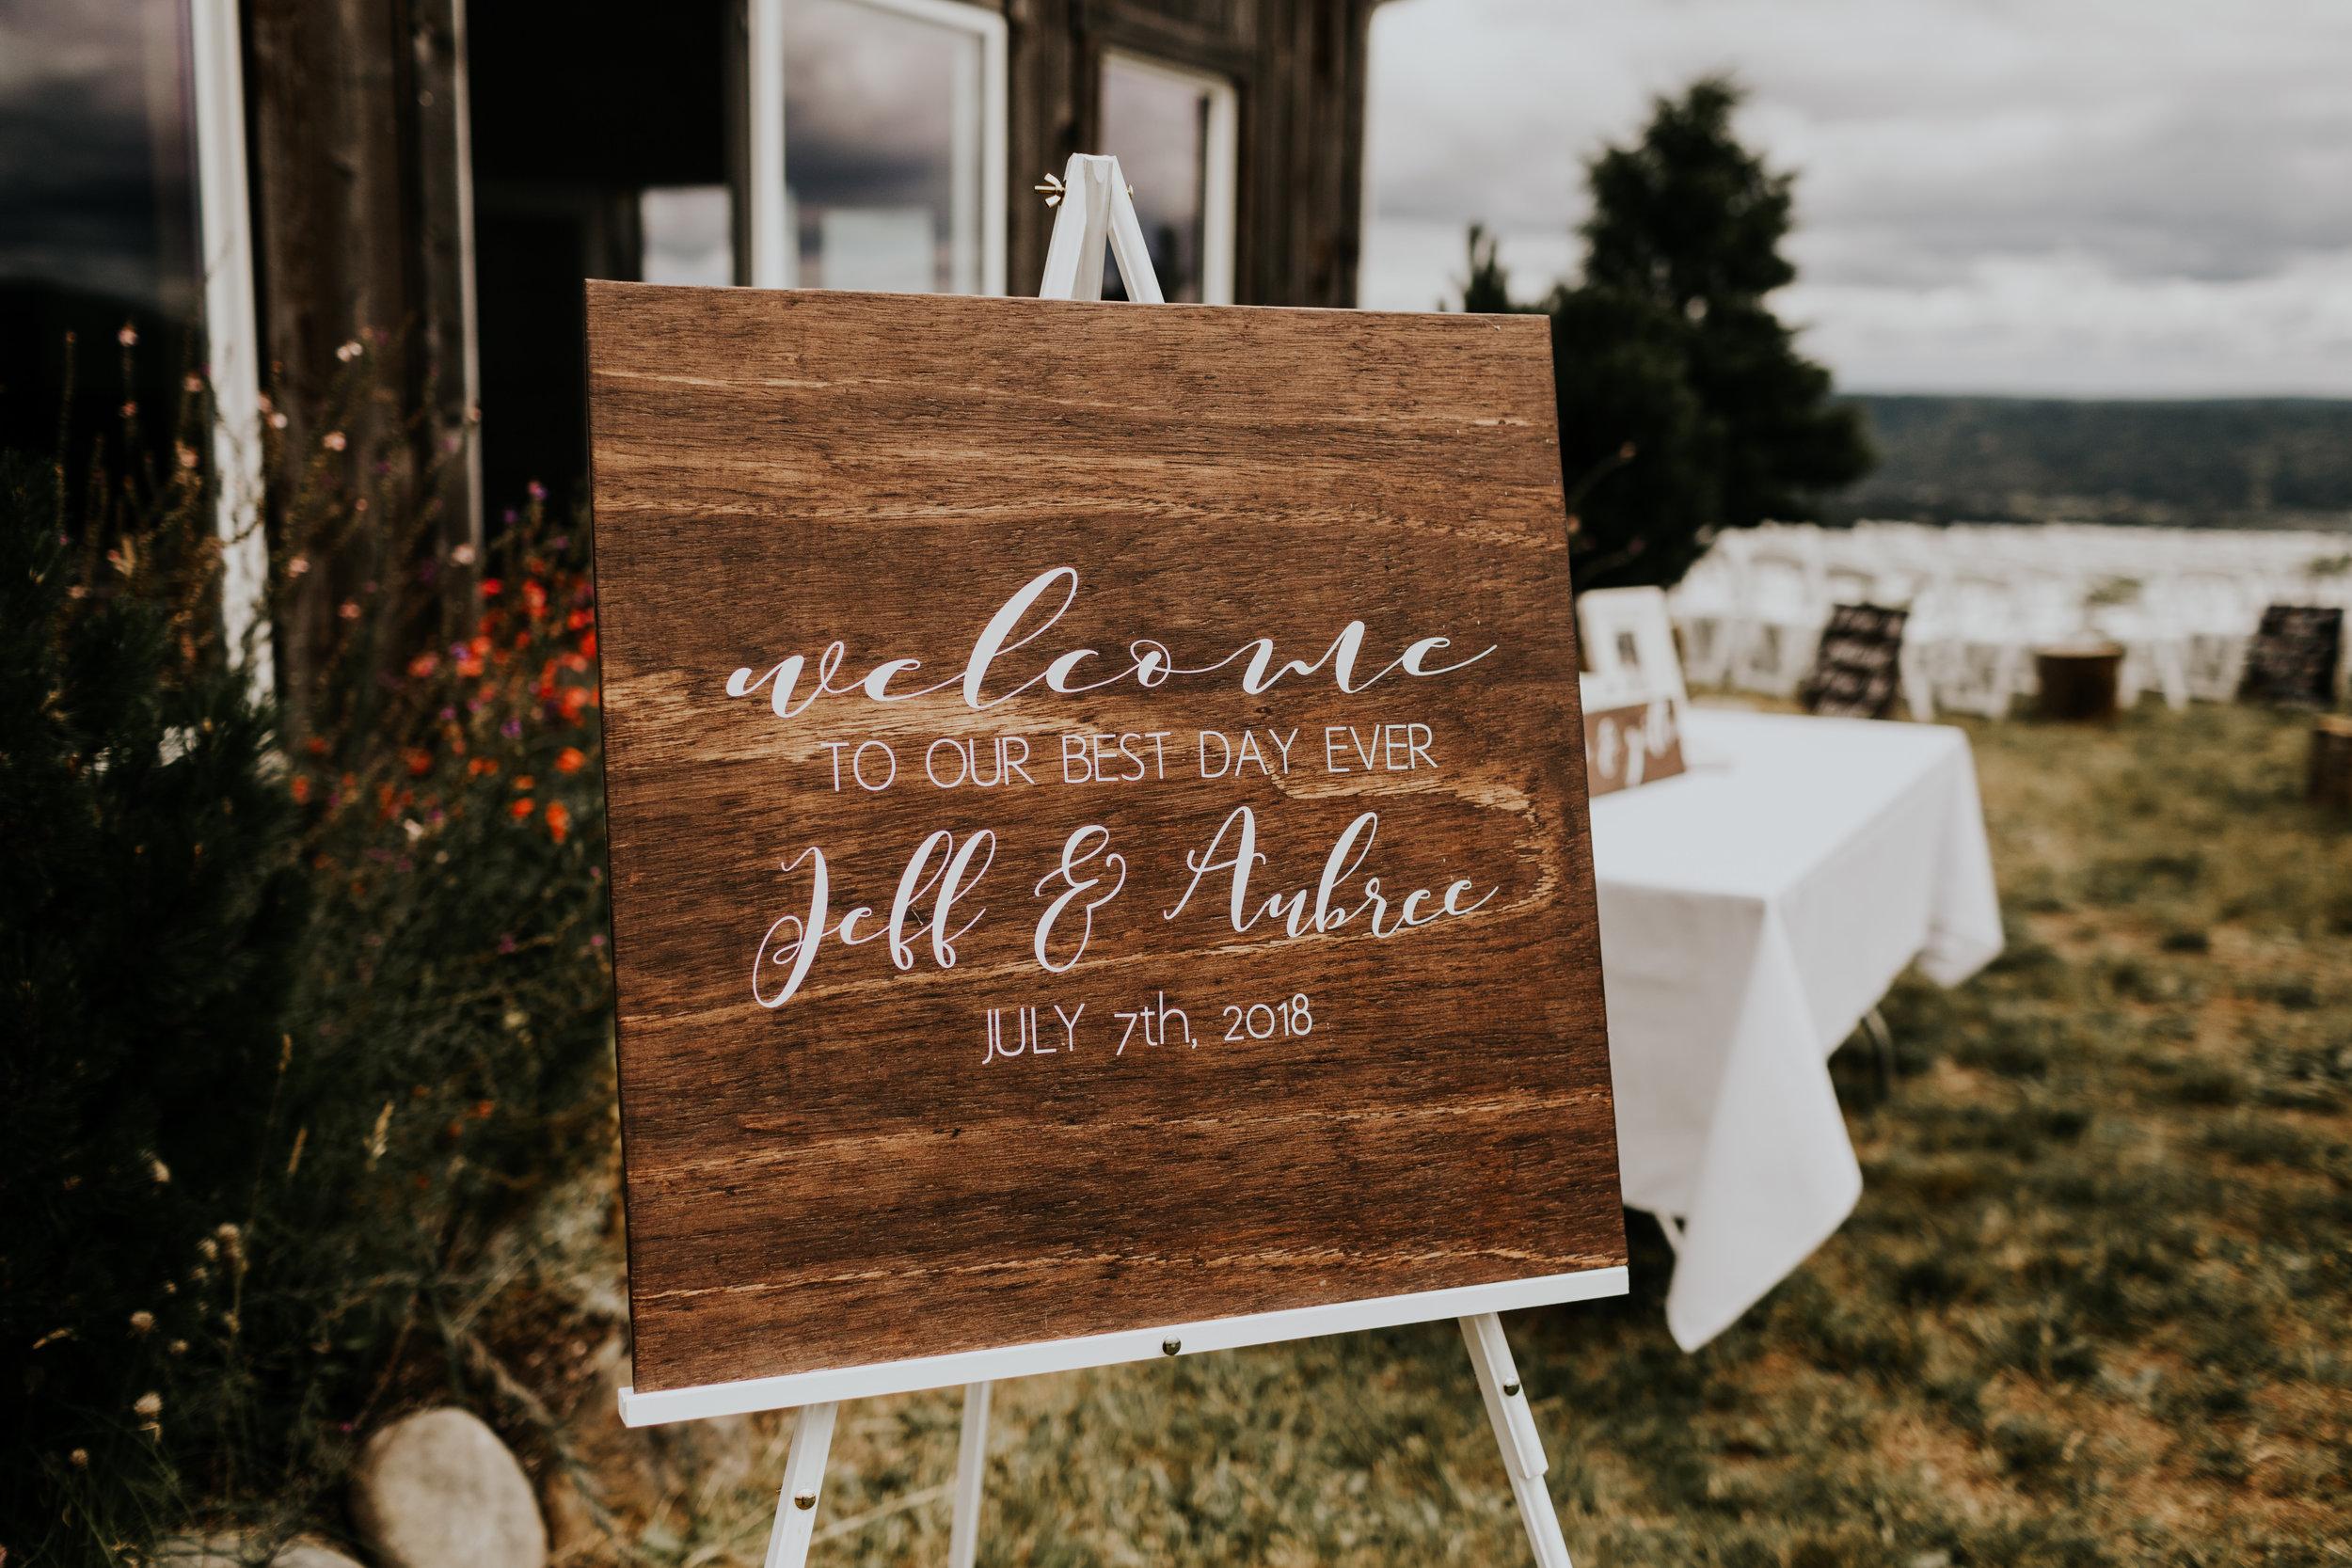 ginapaulson_aubreejeff_wedding-1.jpg